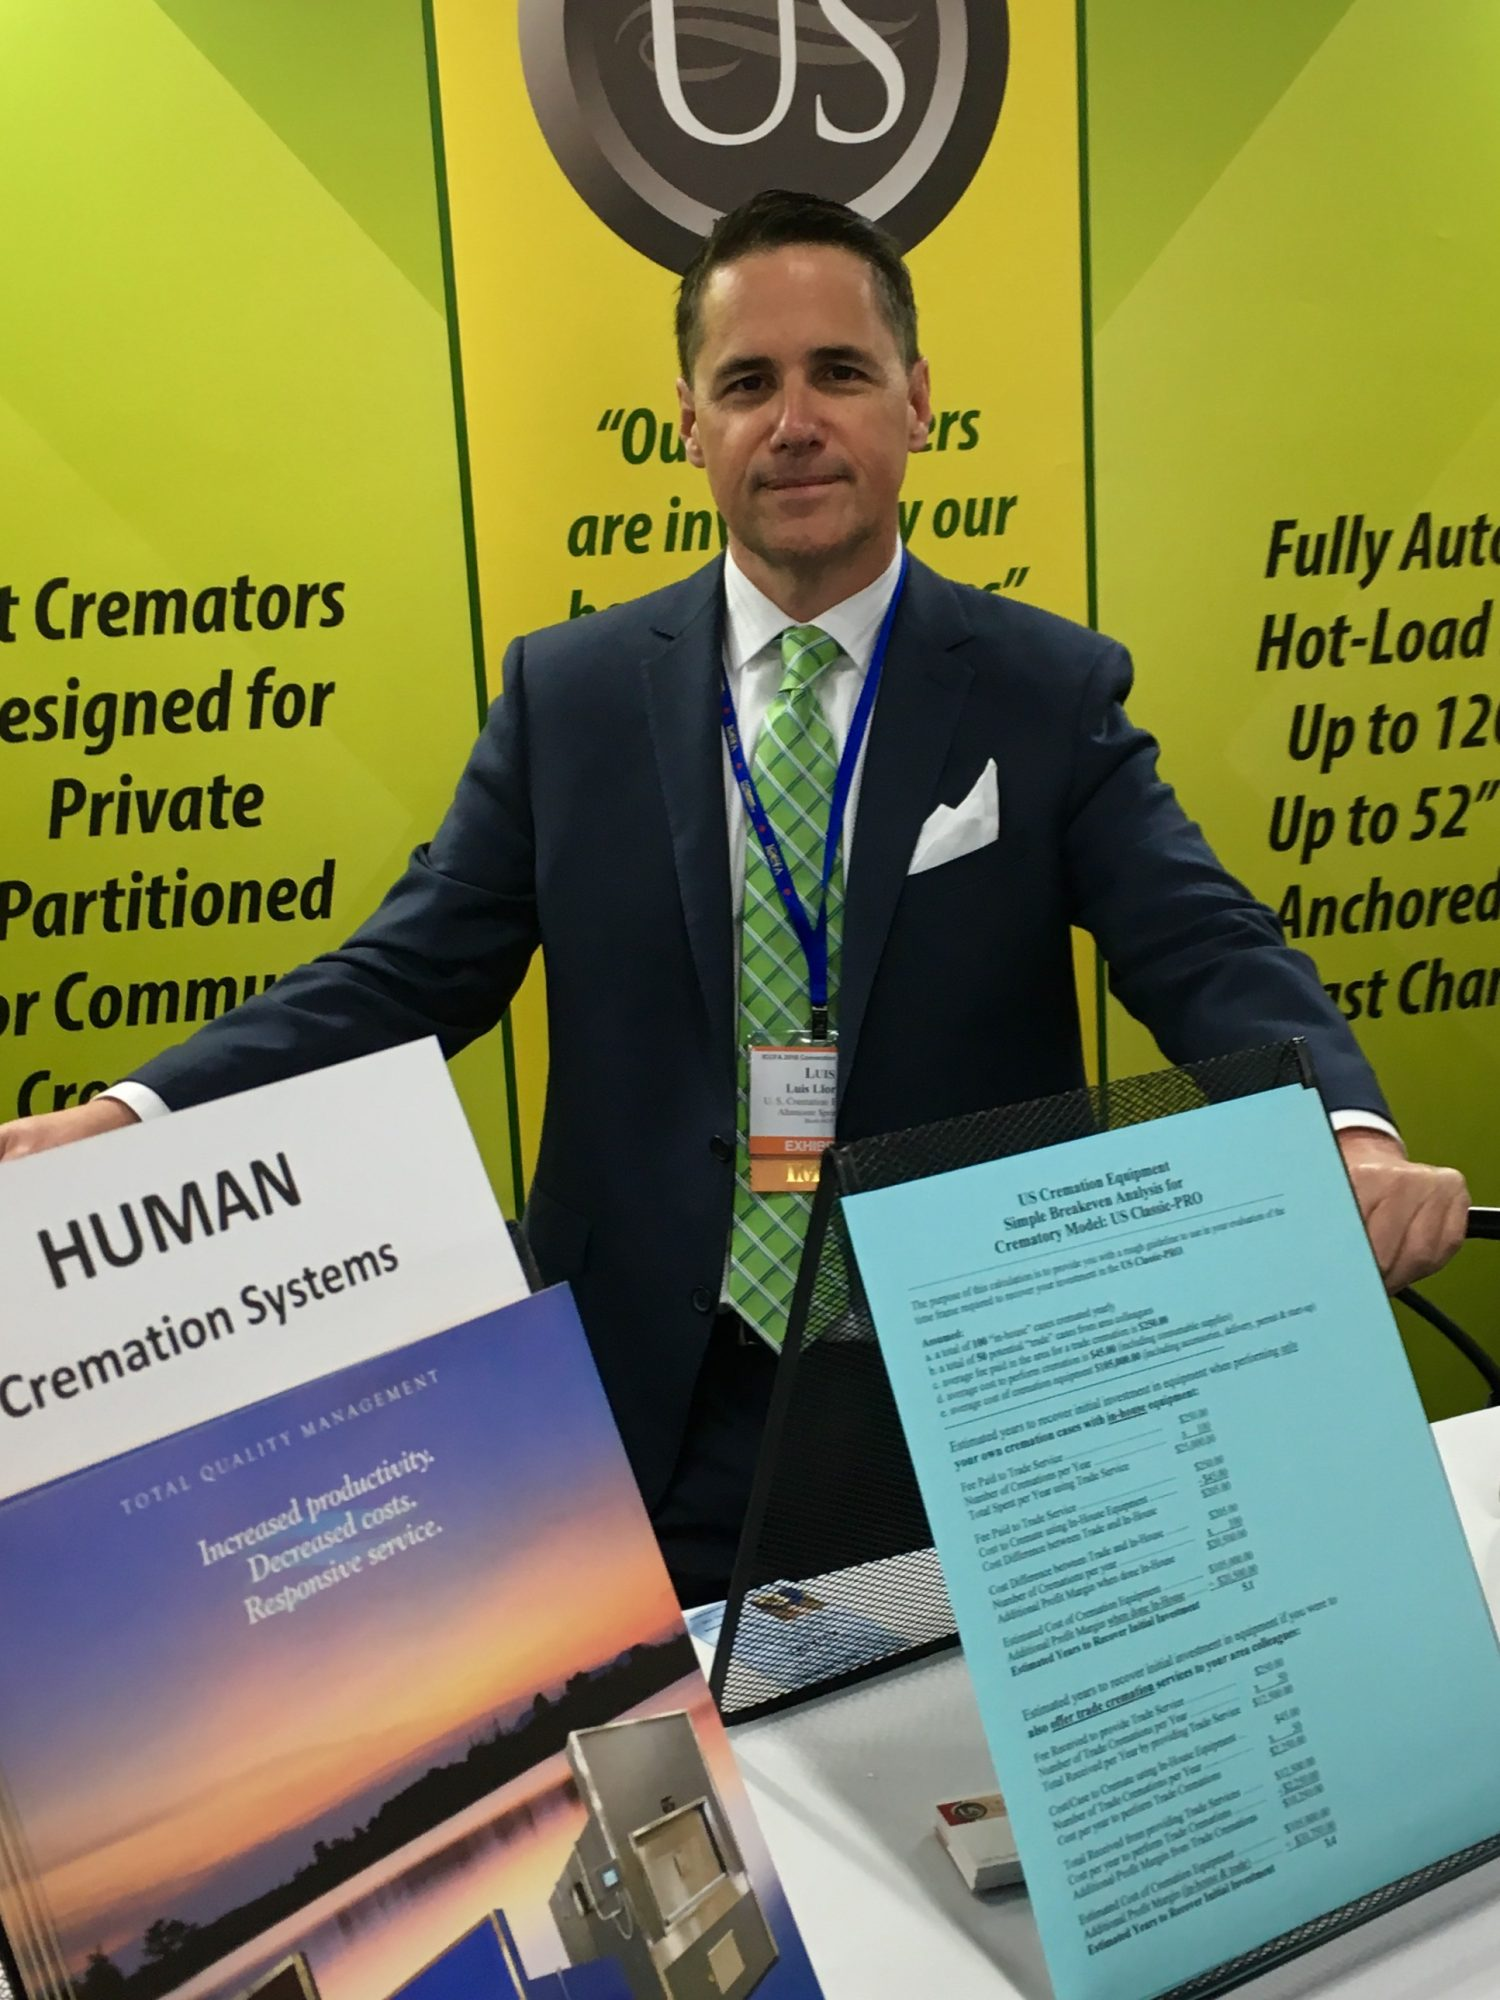 2018 ICCFA tradeshow in Las Vegas